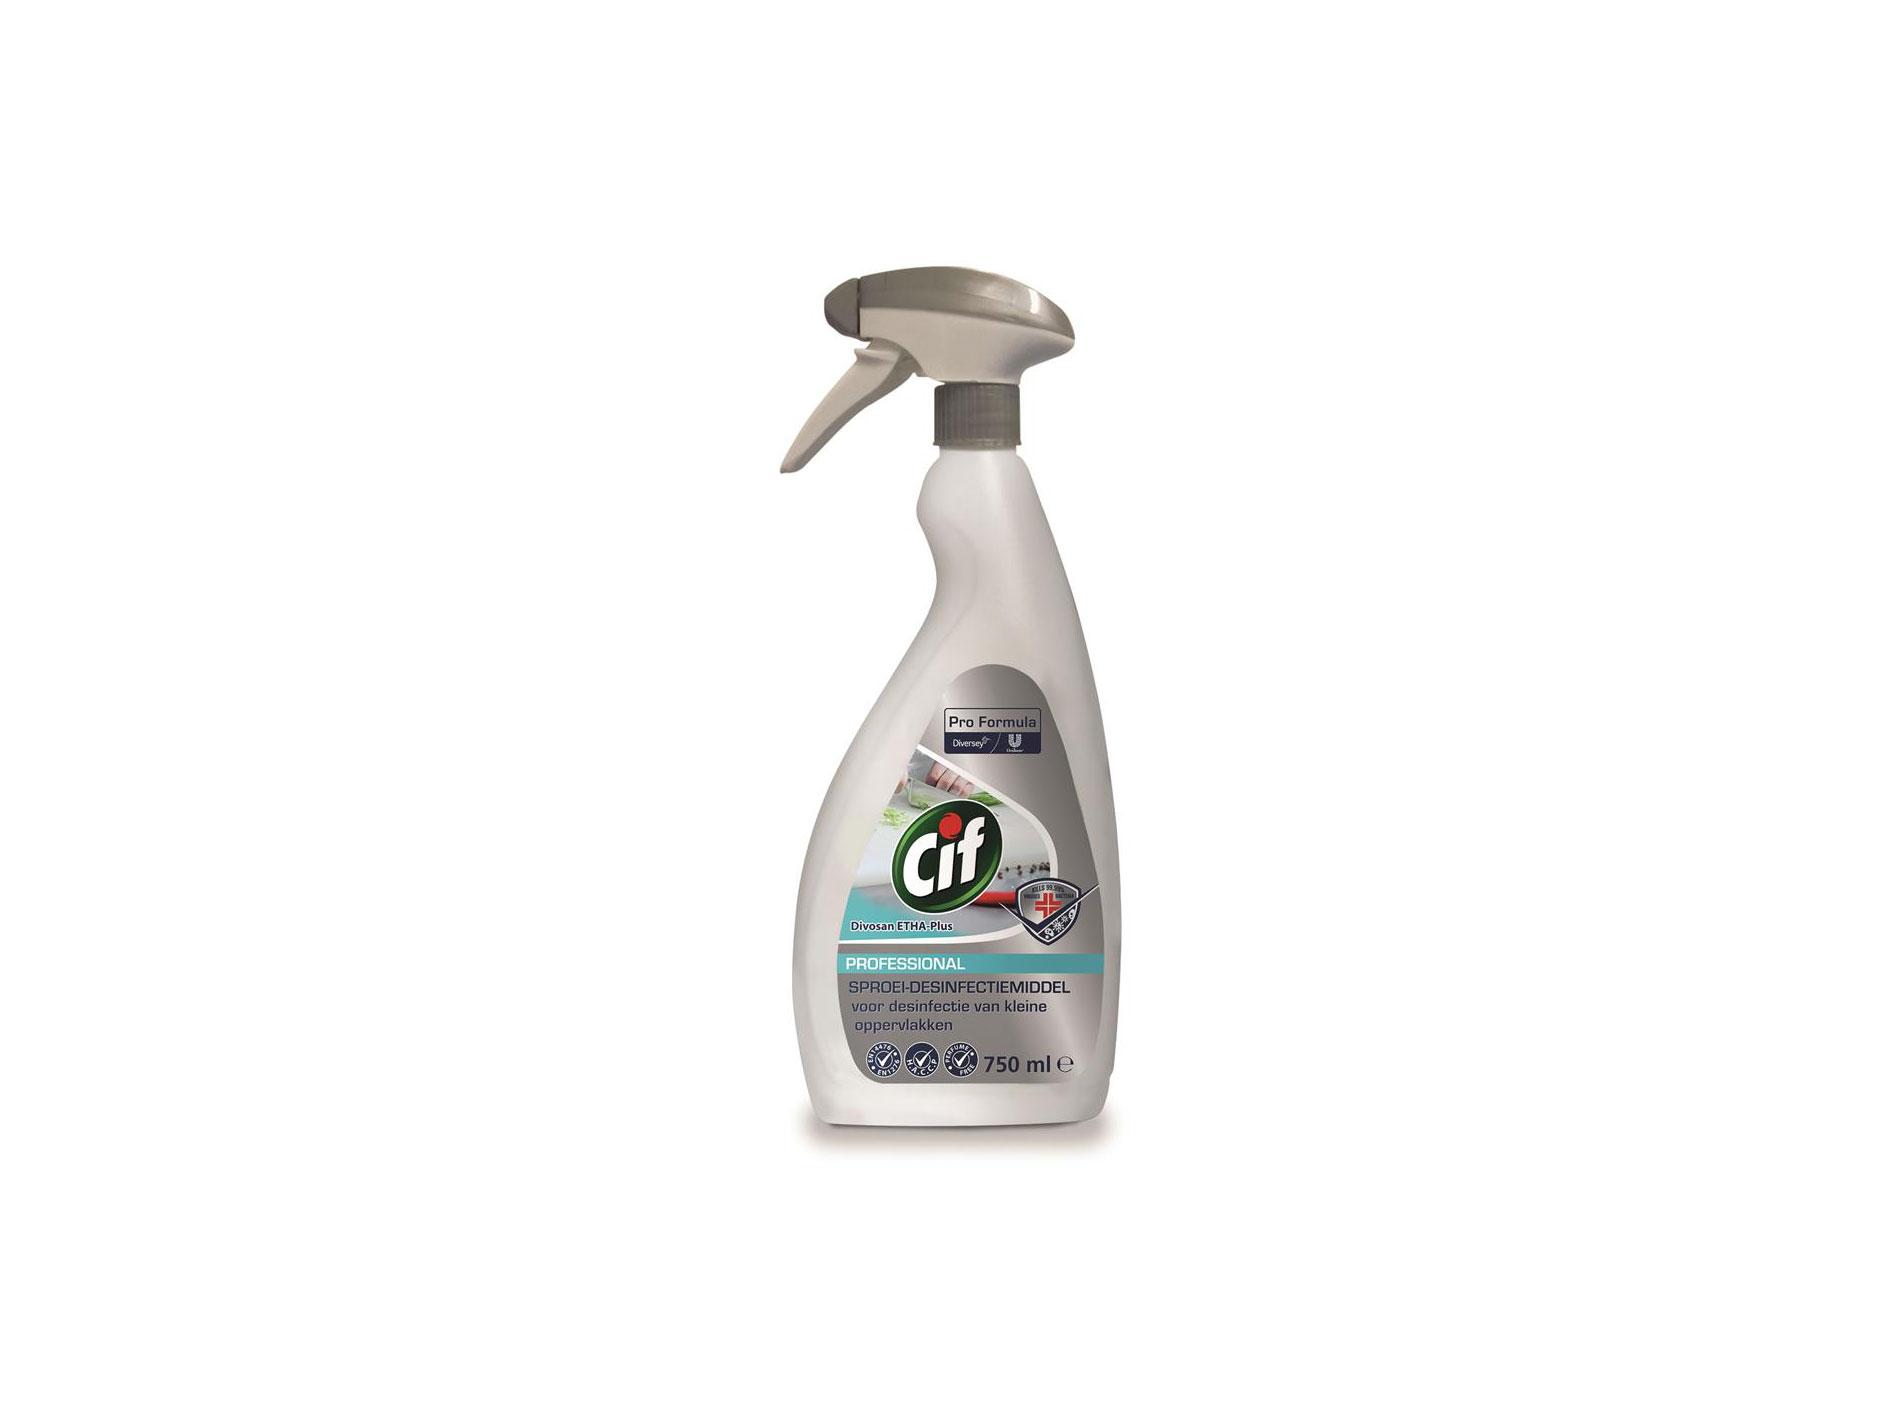 Cif Pro Formula Sproei-desinfectiemiddel